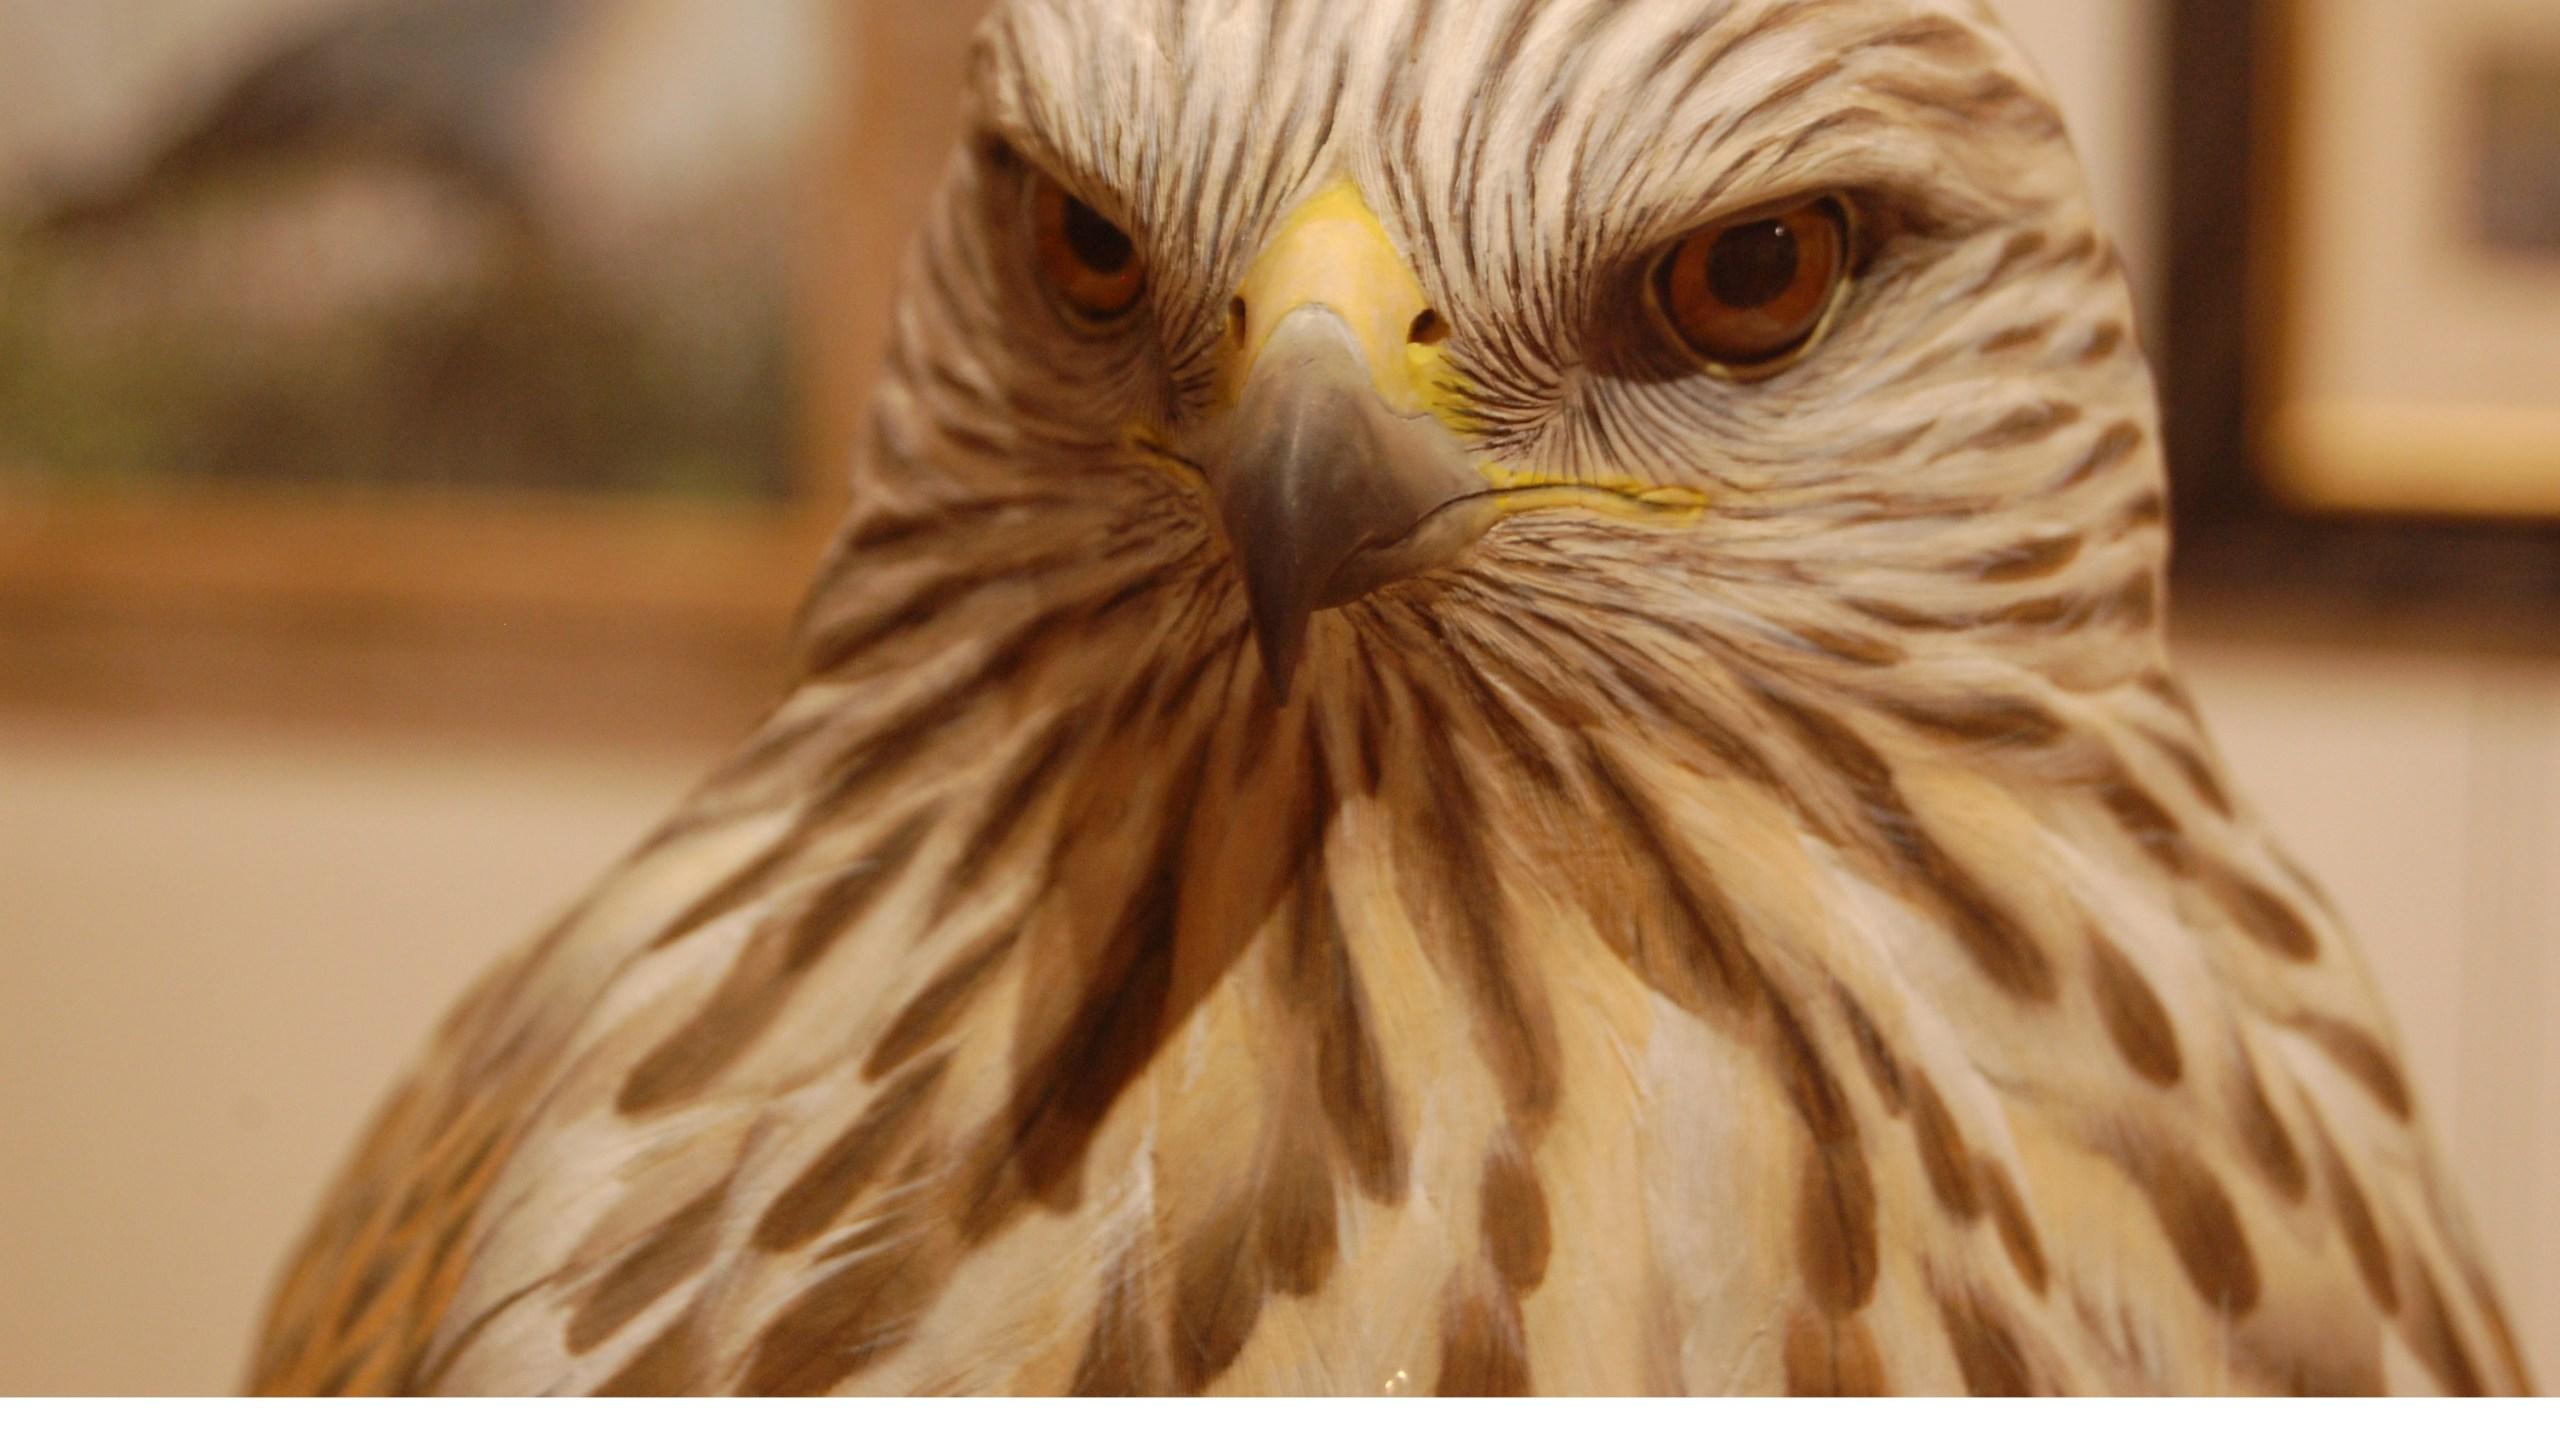 Woodson Art Museum Birds in Art 2017_1508236237886.JPG